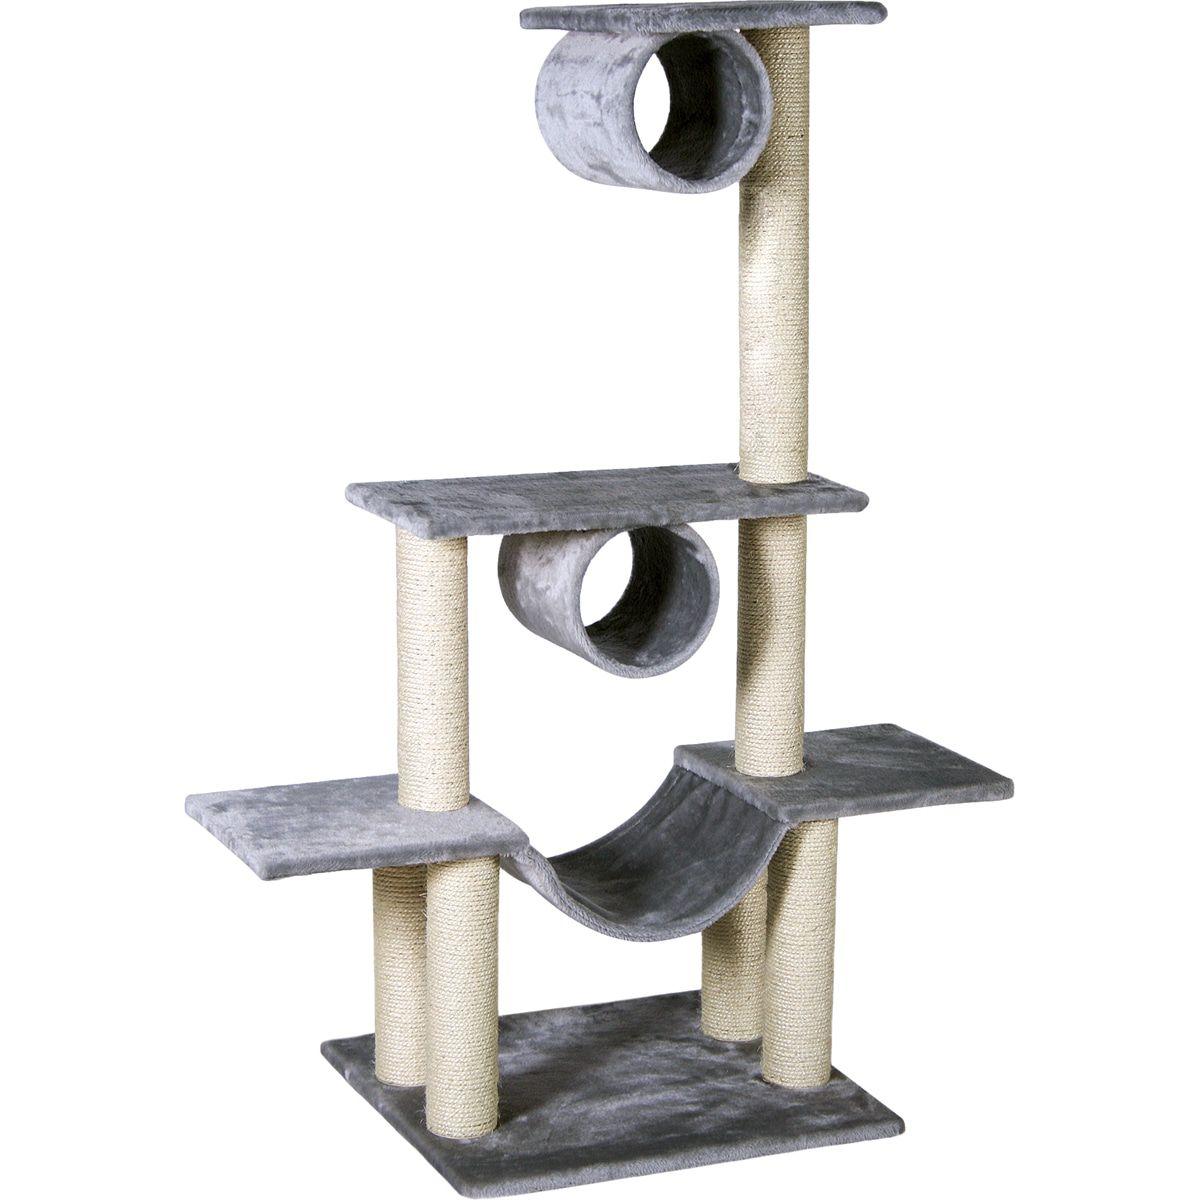 Krabpaal-Amedeo-Grijs-103-x-57-x-141-cm-Flamingo-Grijs